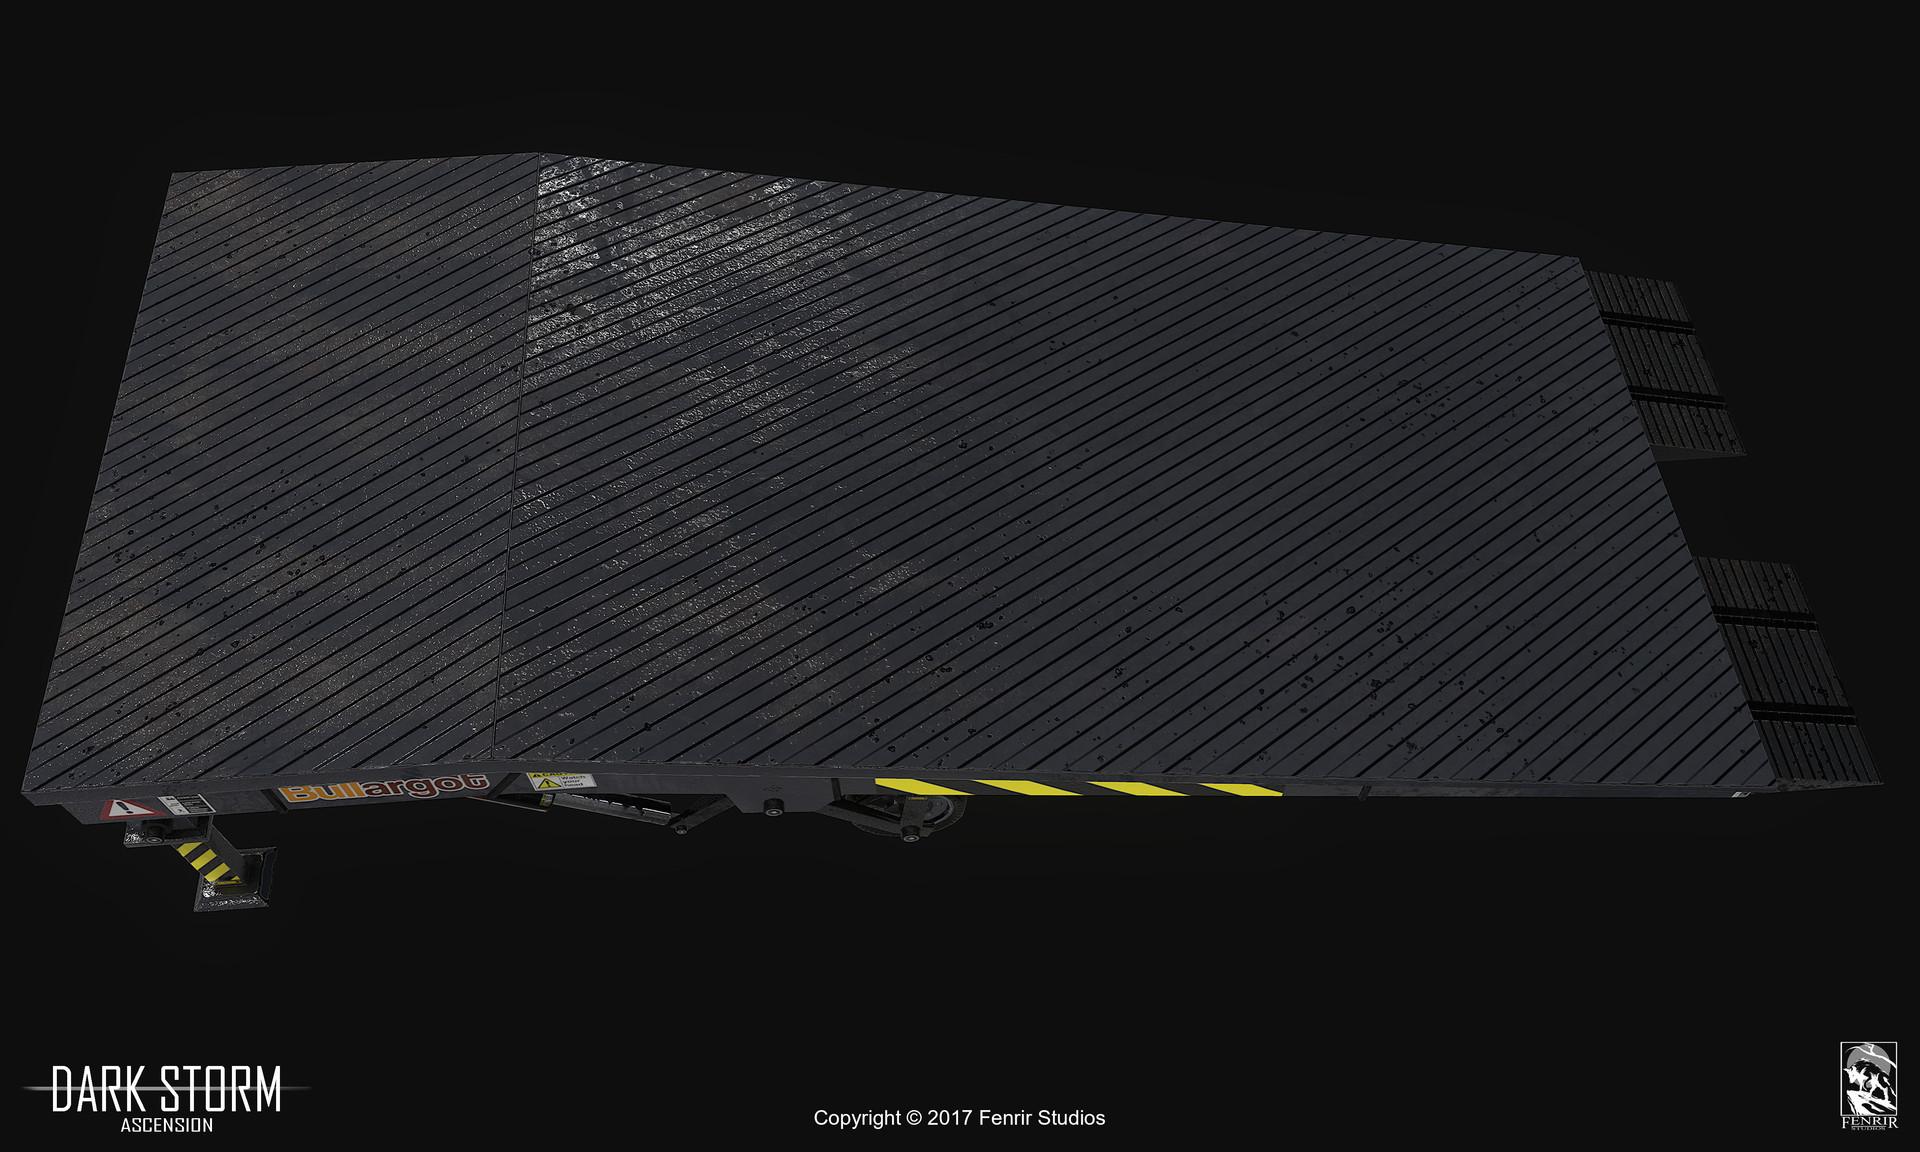 Nikolaos kaltsogiannis cargo ramp presentation 03